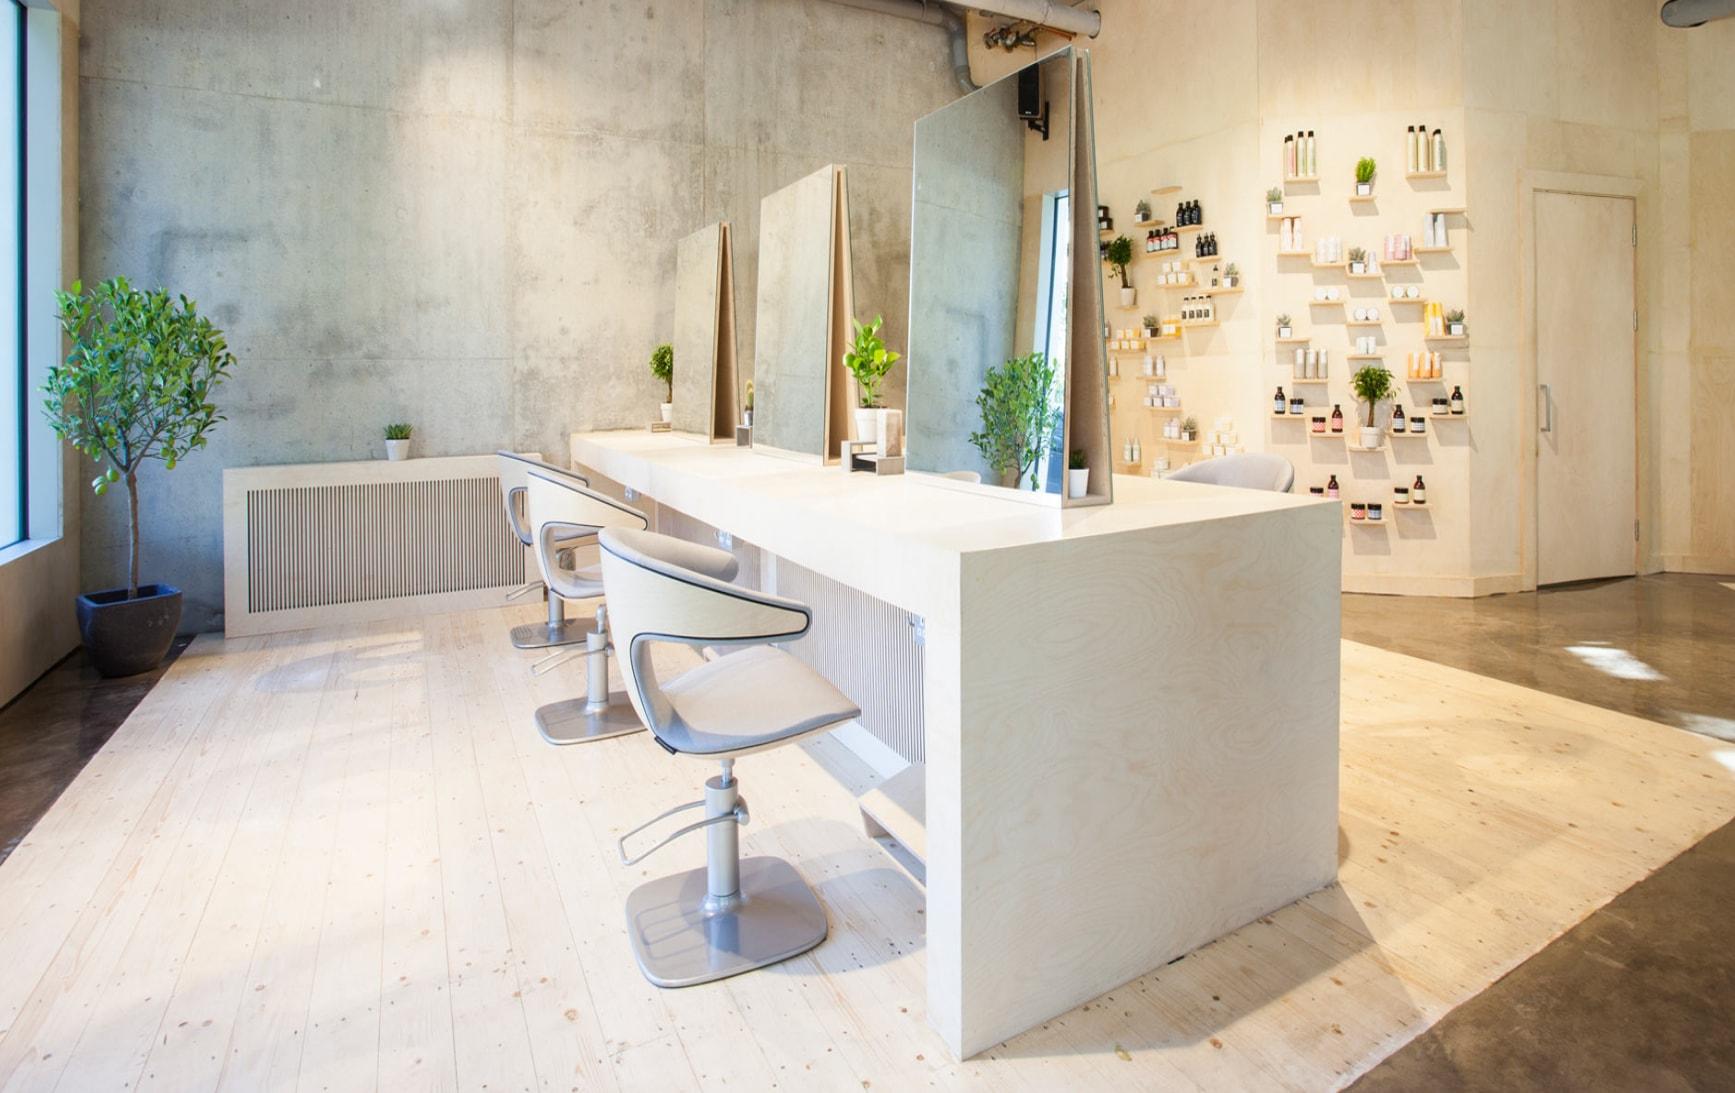 hairdressers in london - salon design